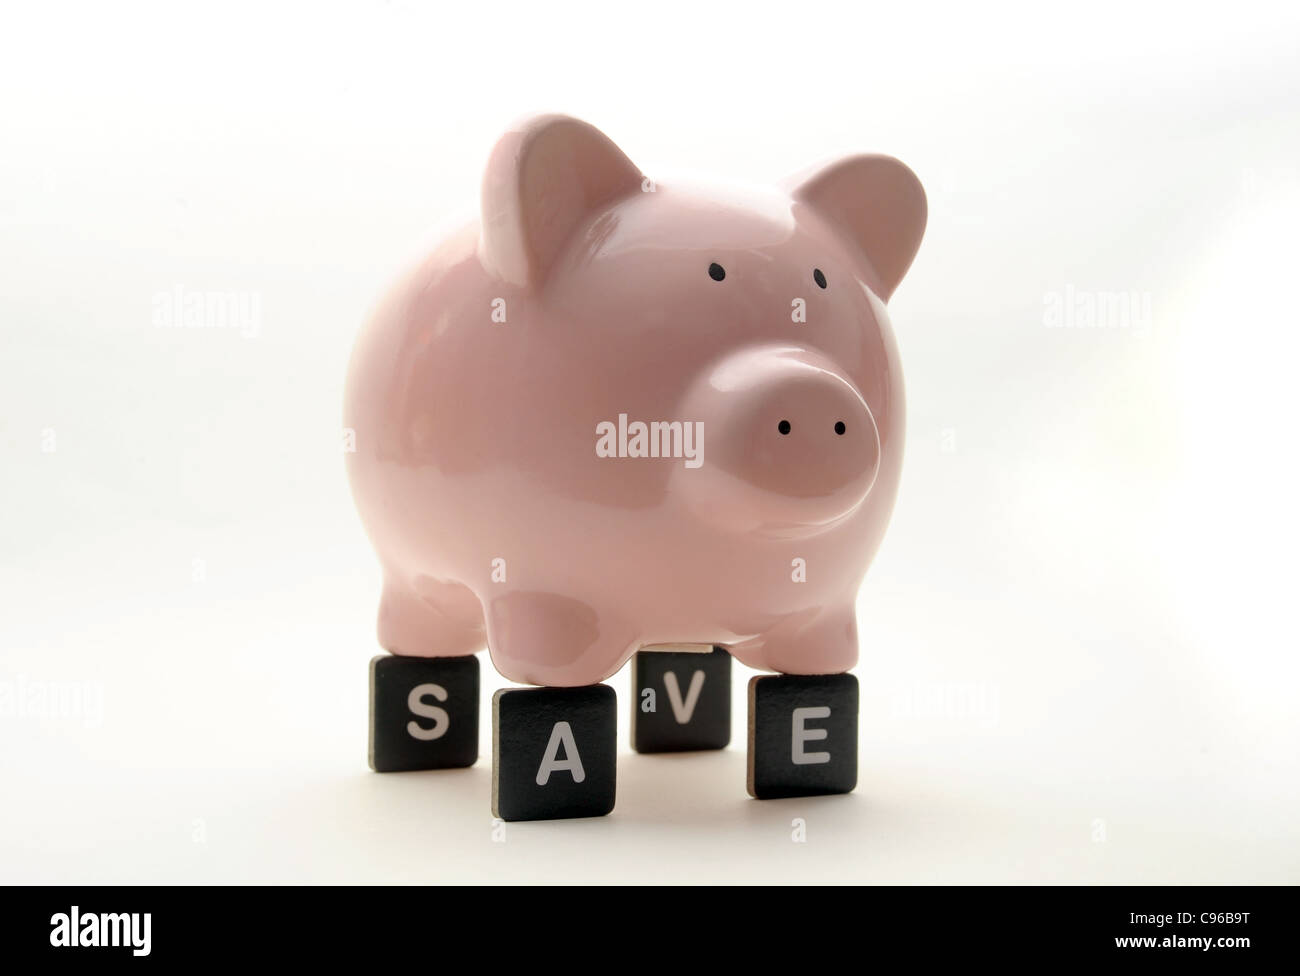 PIGGYBANK ON LETTERS SPELLING 'SAVE' RE FINANCIAL CRISIS SAVINGS ECONOMY ECONOMIC DOWNTURN MONEY  BANKS - Stock Image